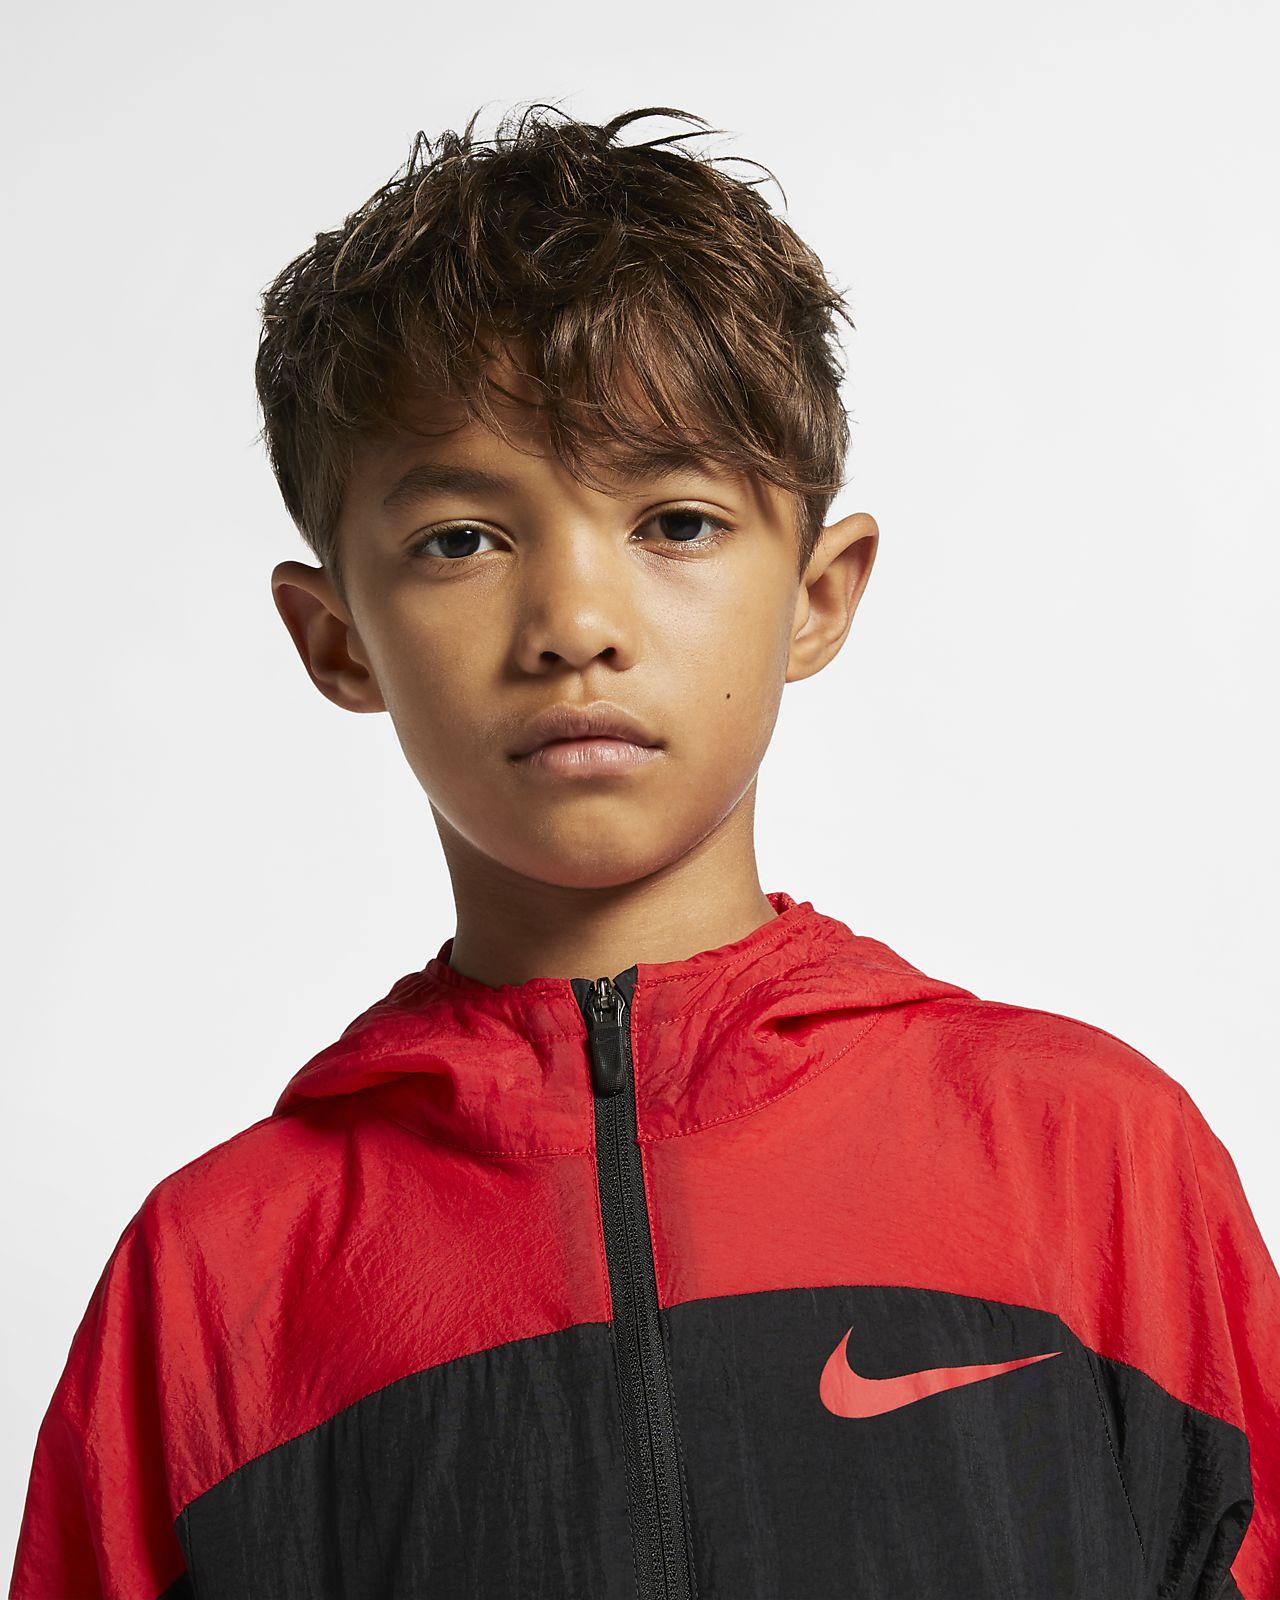 776b7aa84 Nike Dri-FIT Older Kids' Woven Training Jacket. Nike.com NL